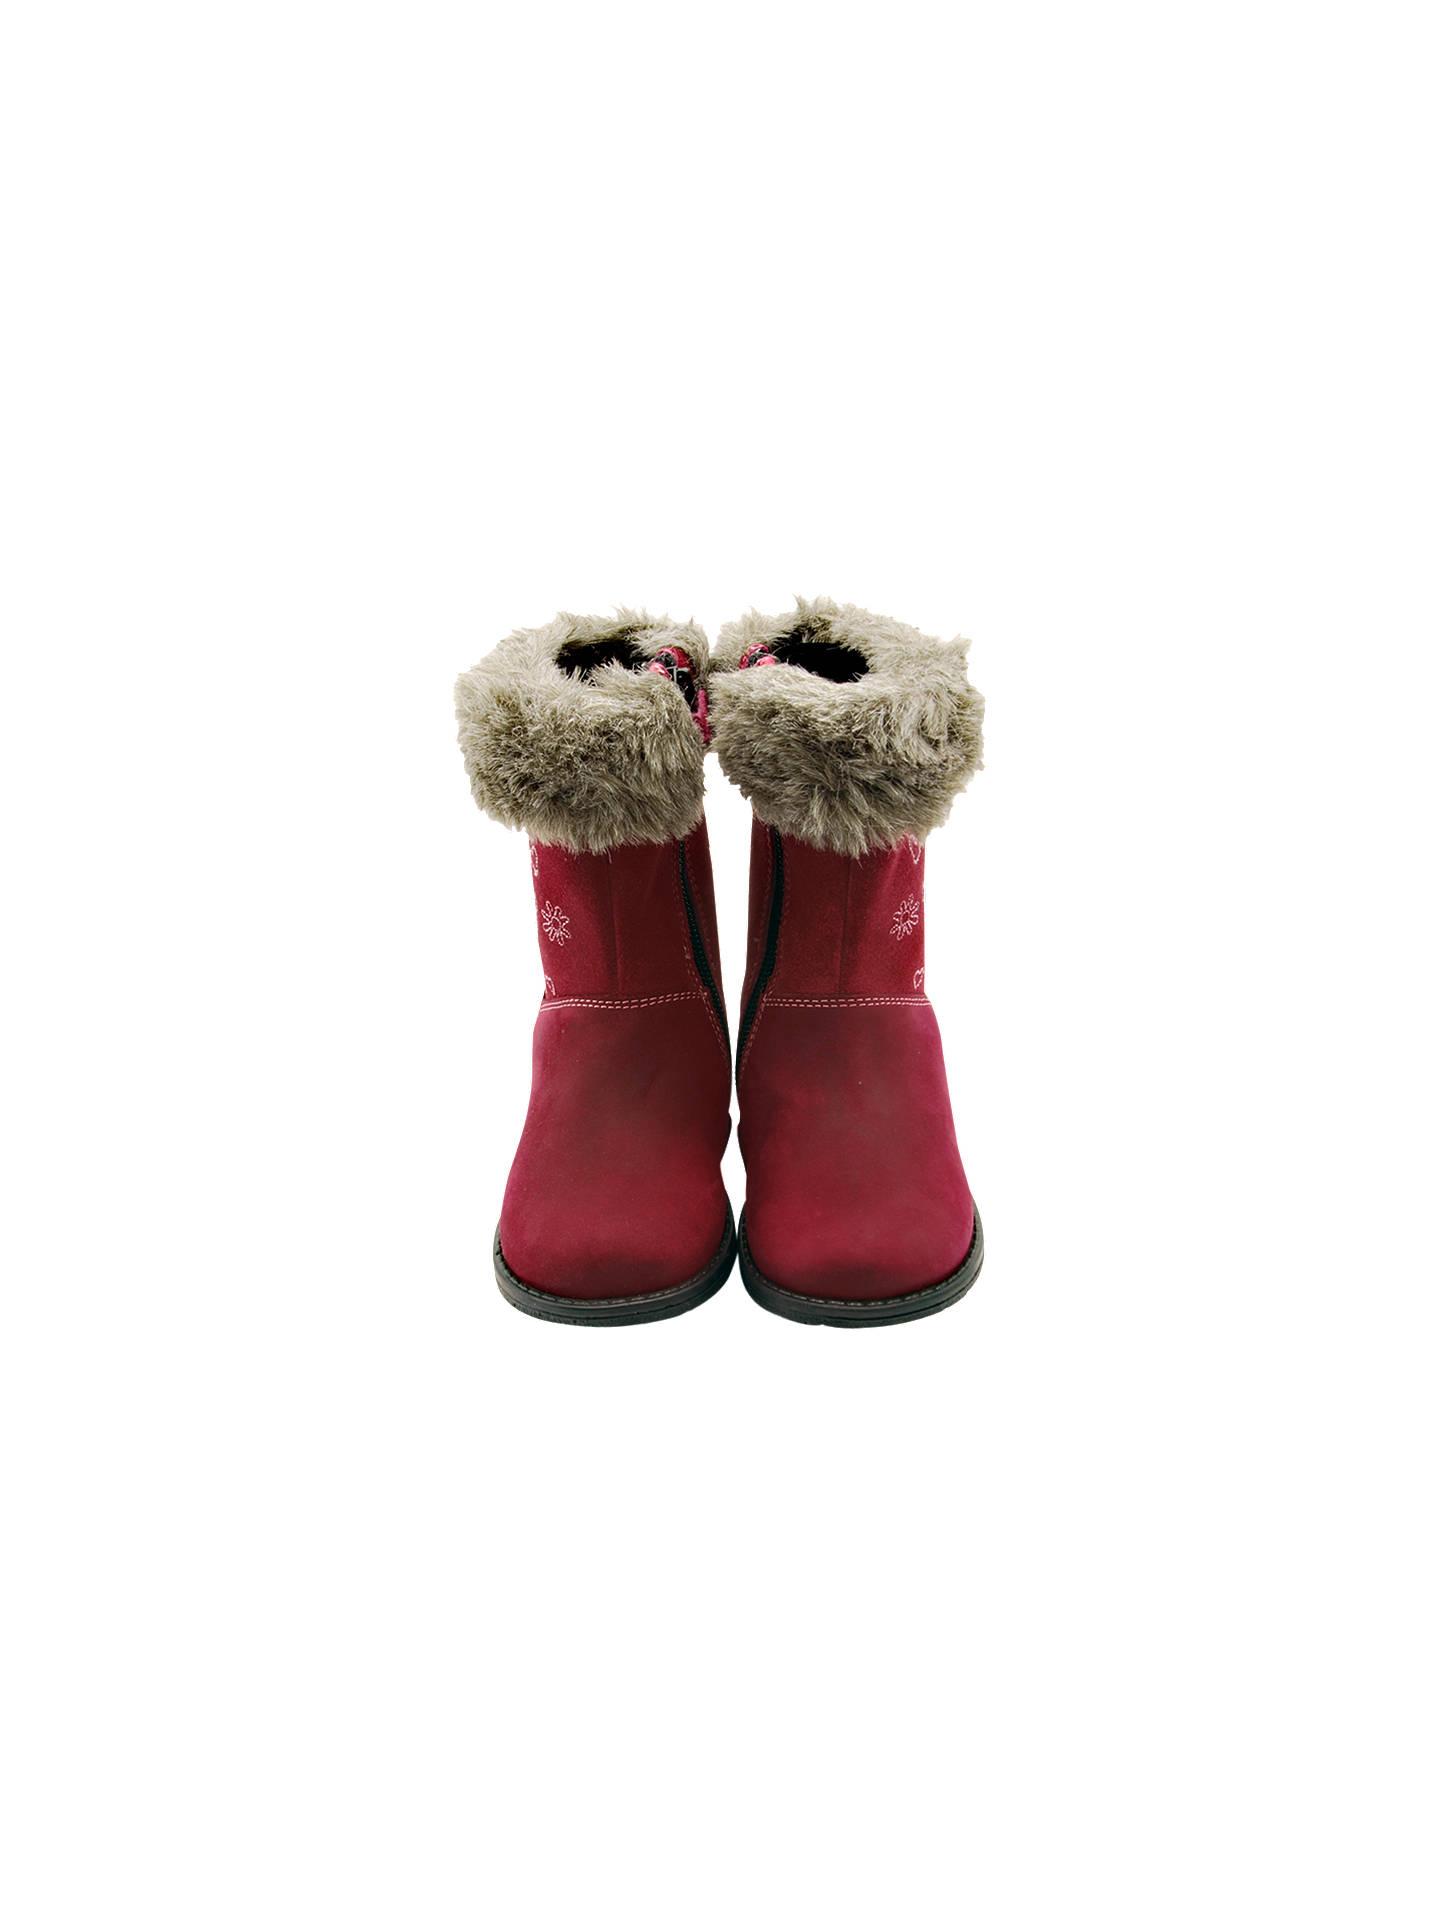 eb607fe22 ... Buy Start-rite Aqua-rite Twilight Calf Boots, Berry, 24F Jnr Online ...